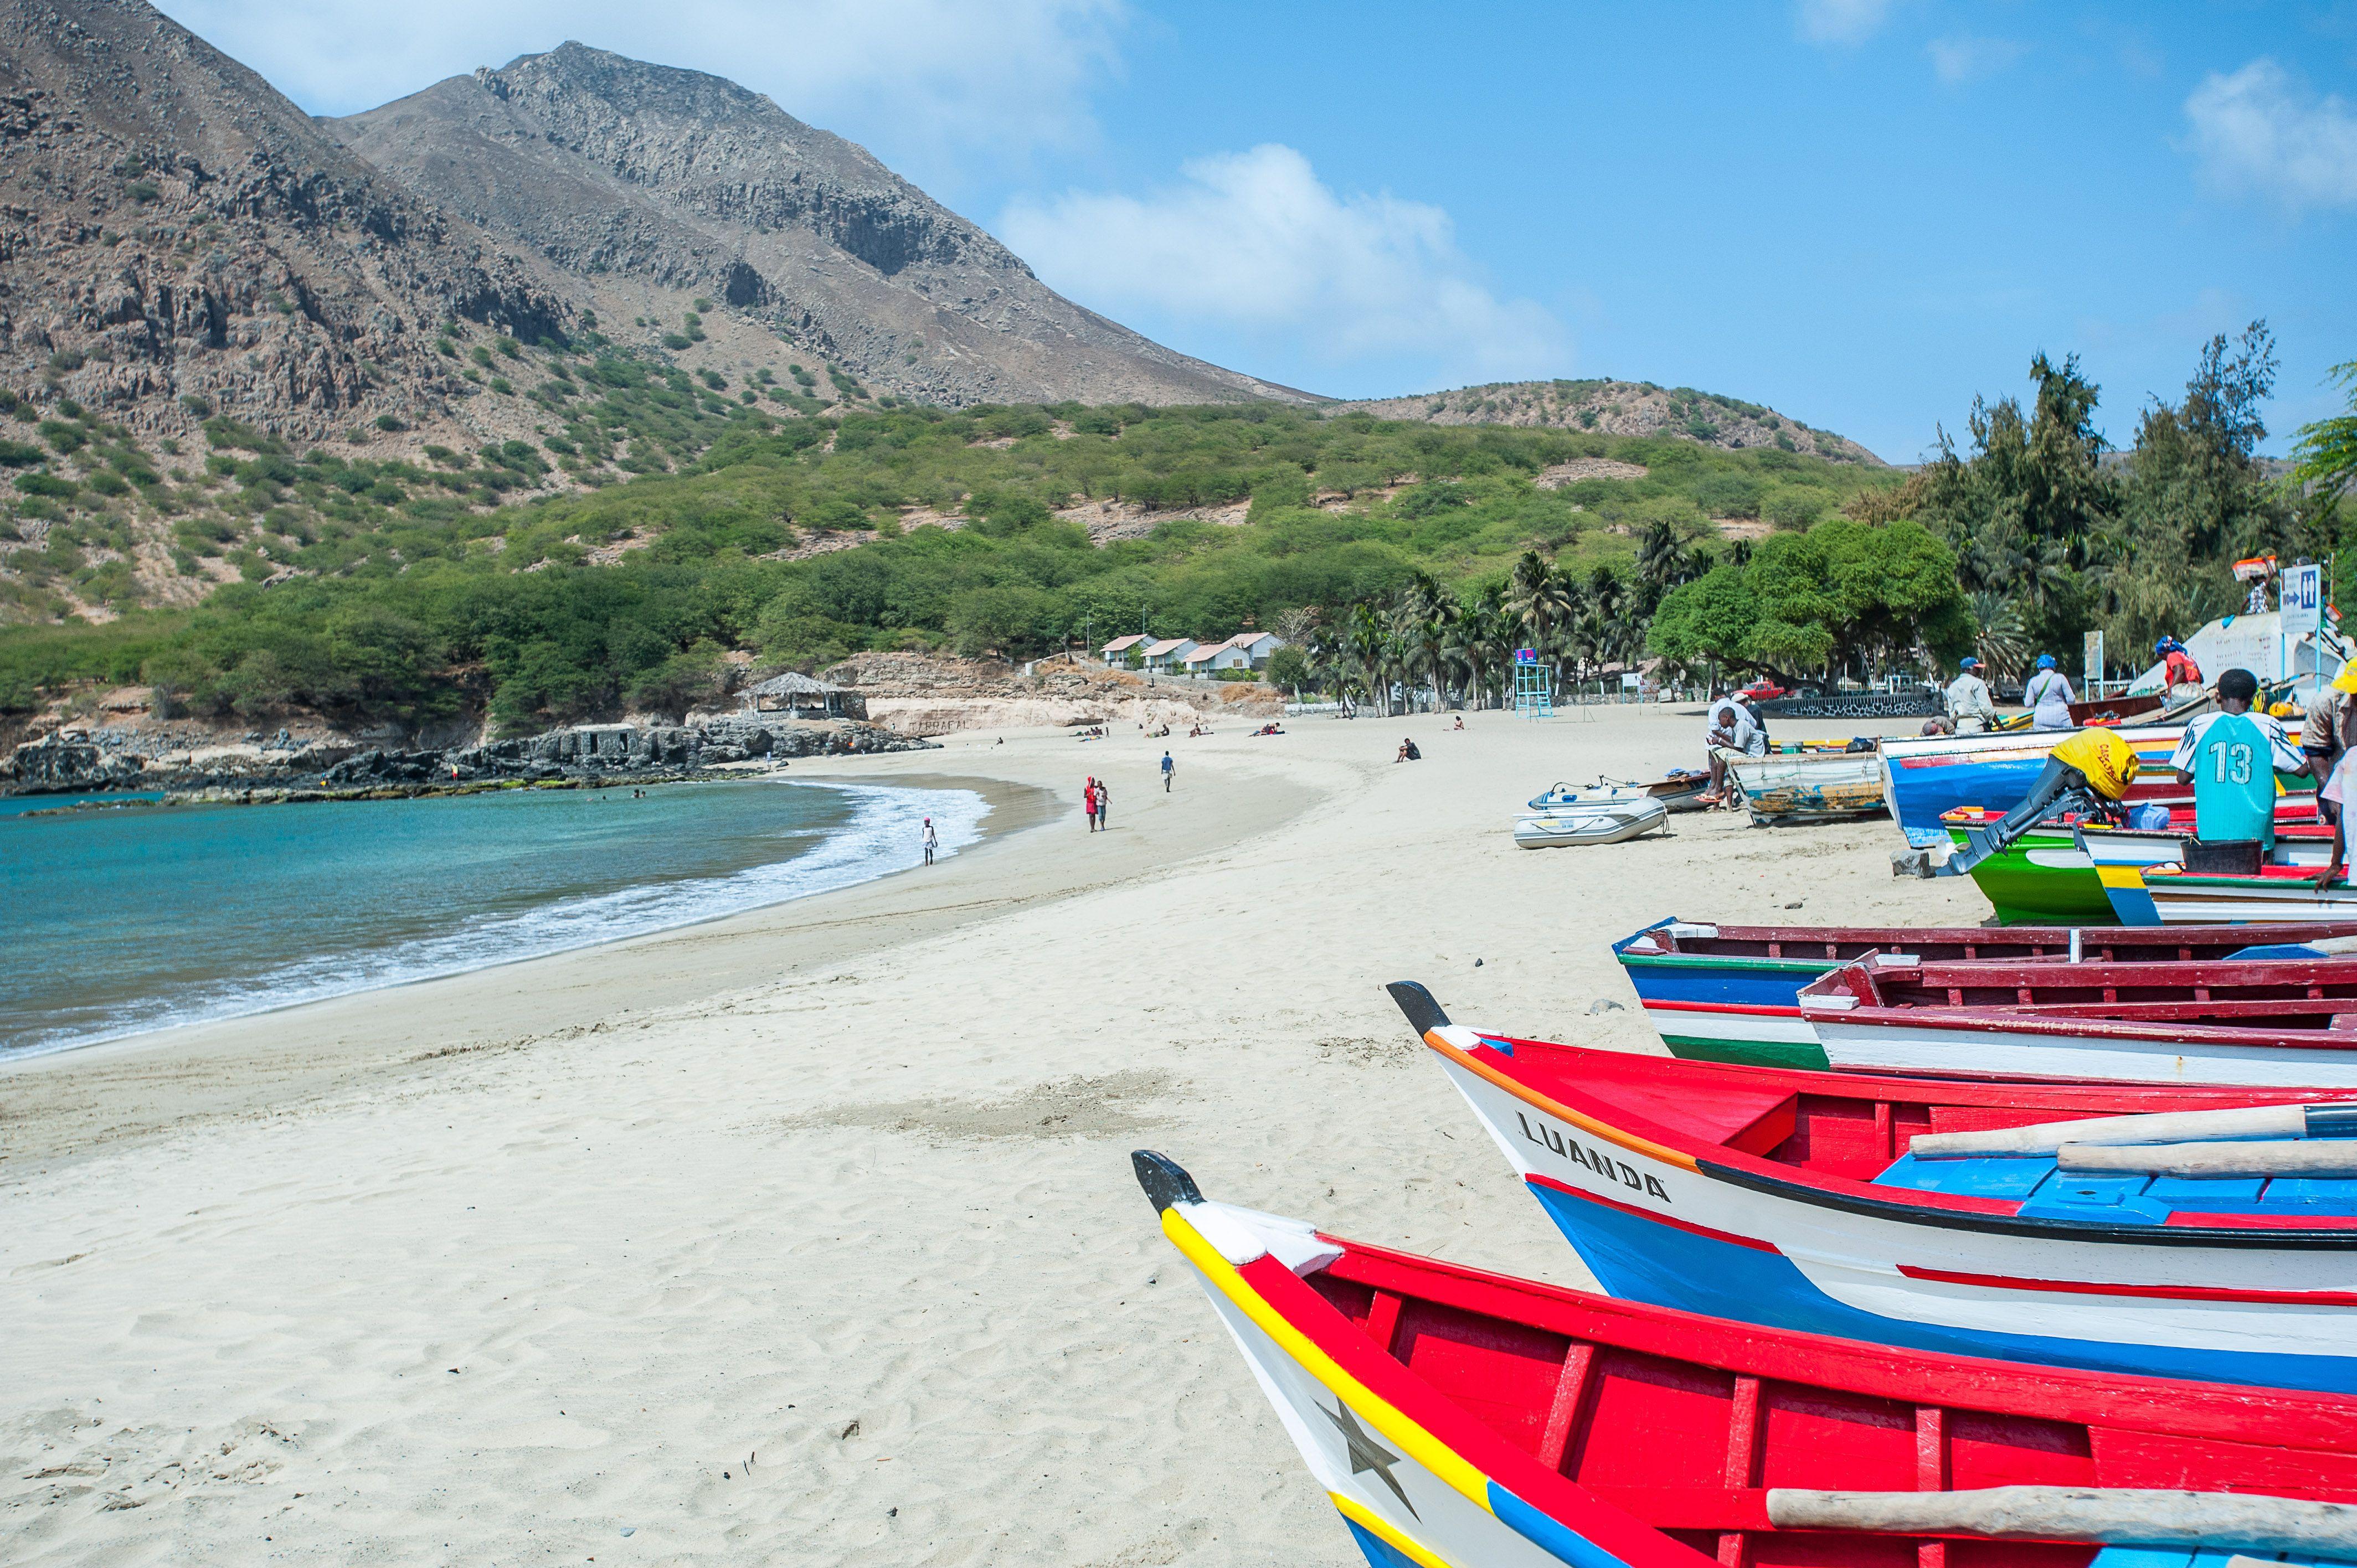 Tarrafal Ilha De Santiago Viagens Cabo Verde Tenerife Resorts